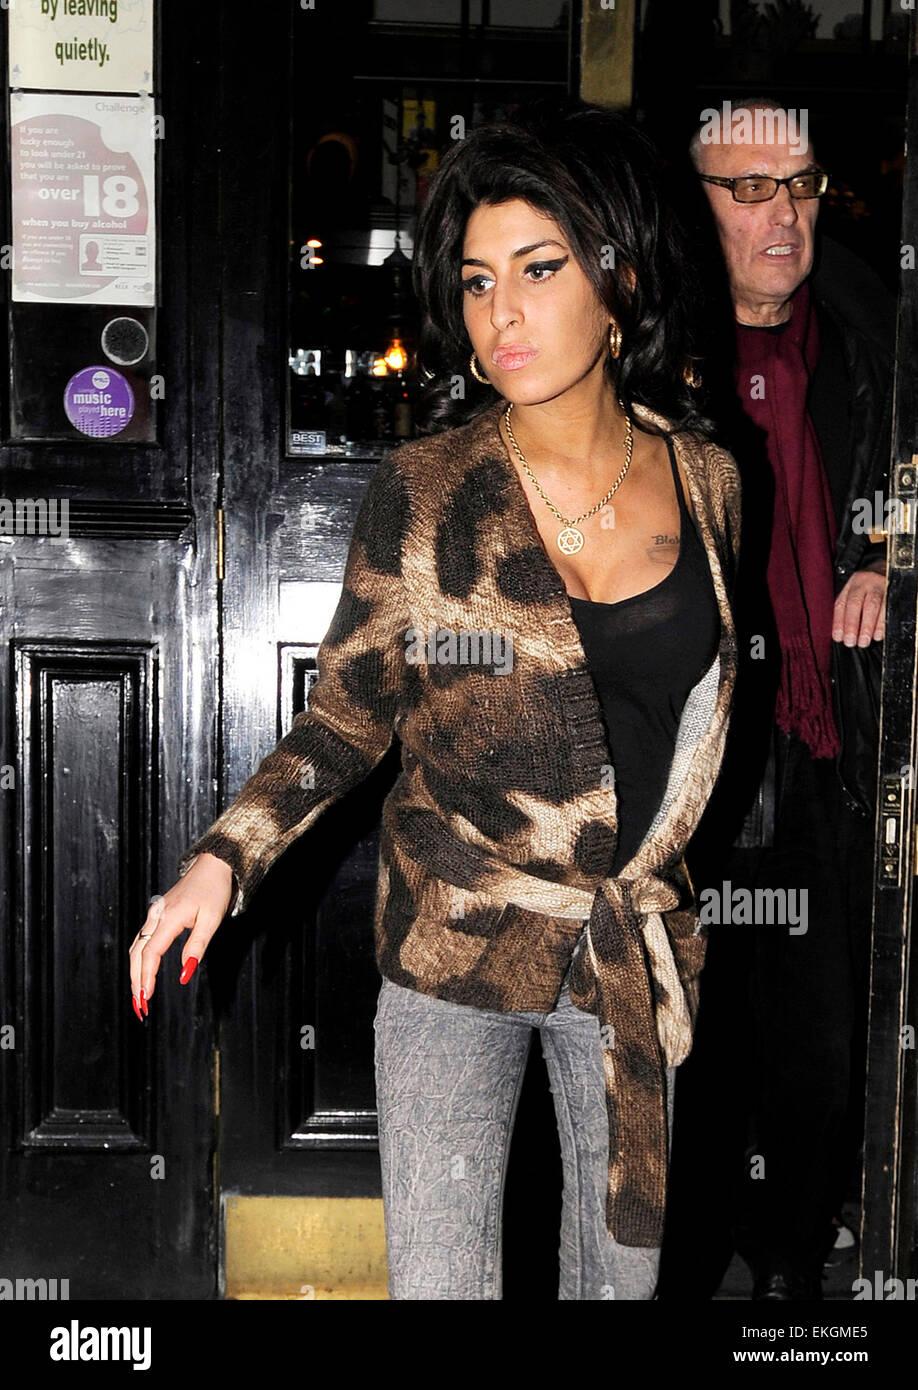 19.FEBRUARY.2008. LONDON A DRUNK AMY WINEHOUSE LEAVING